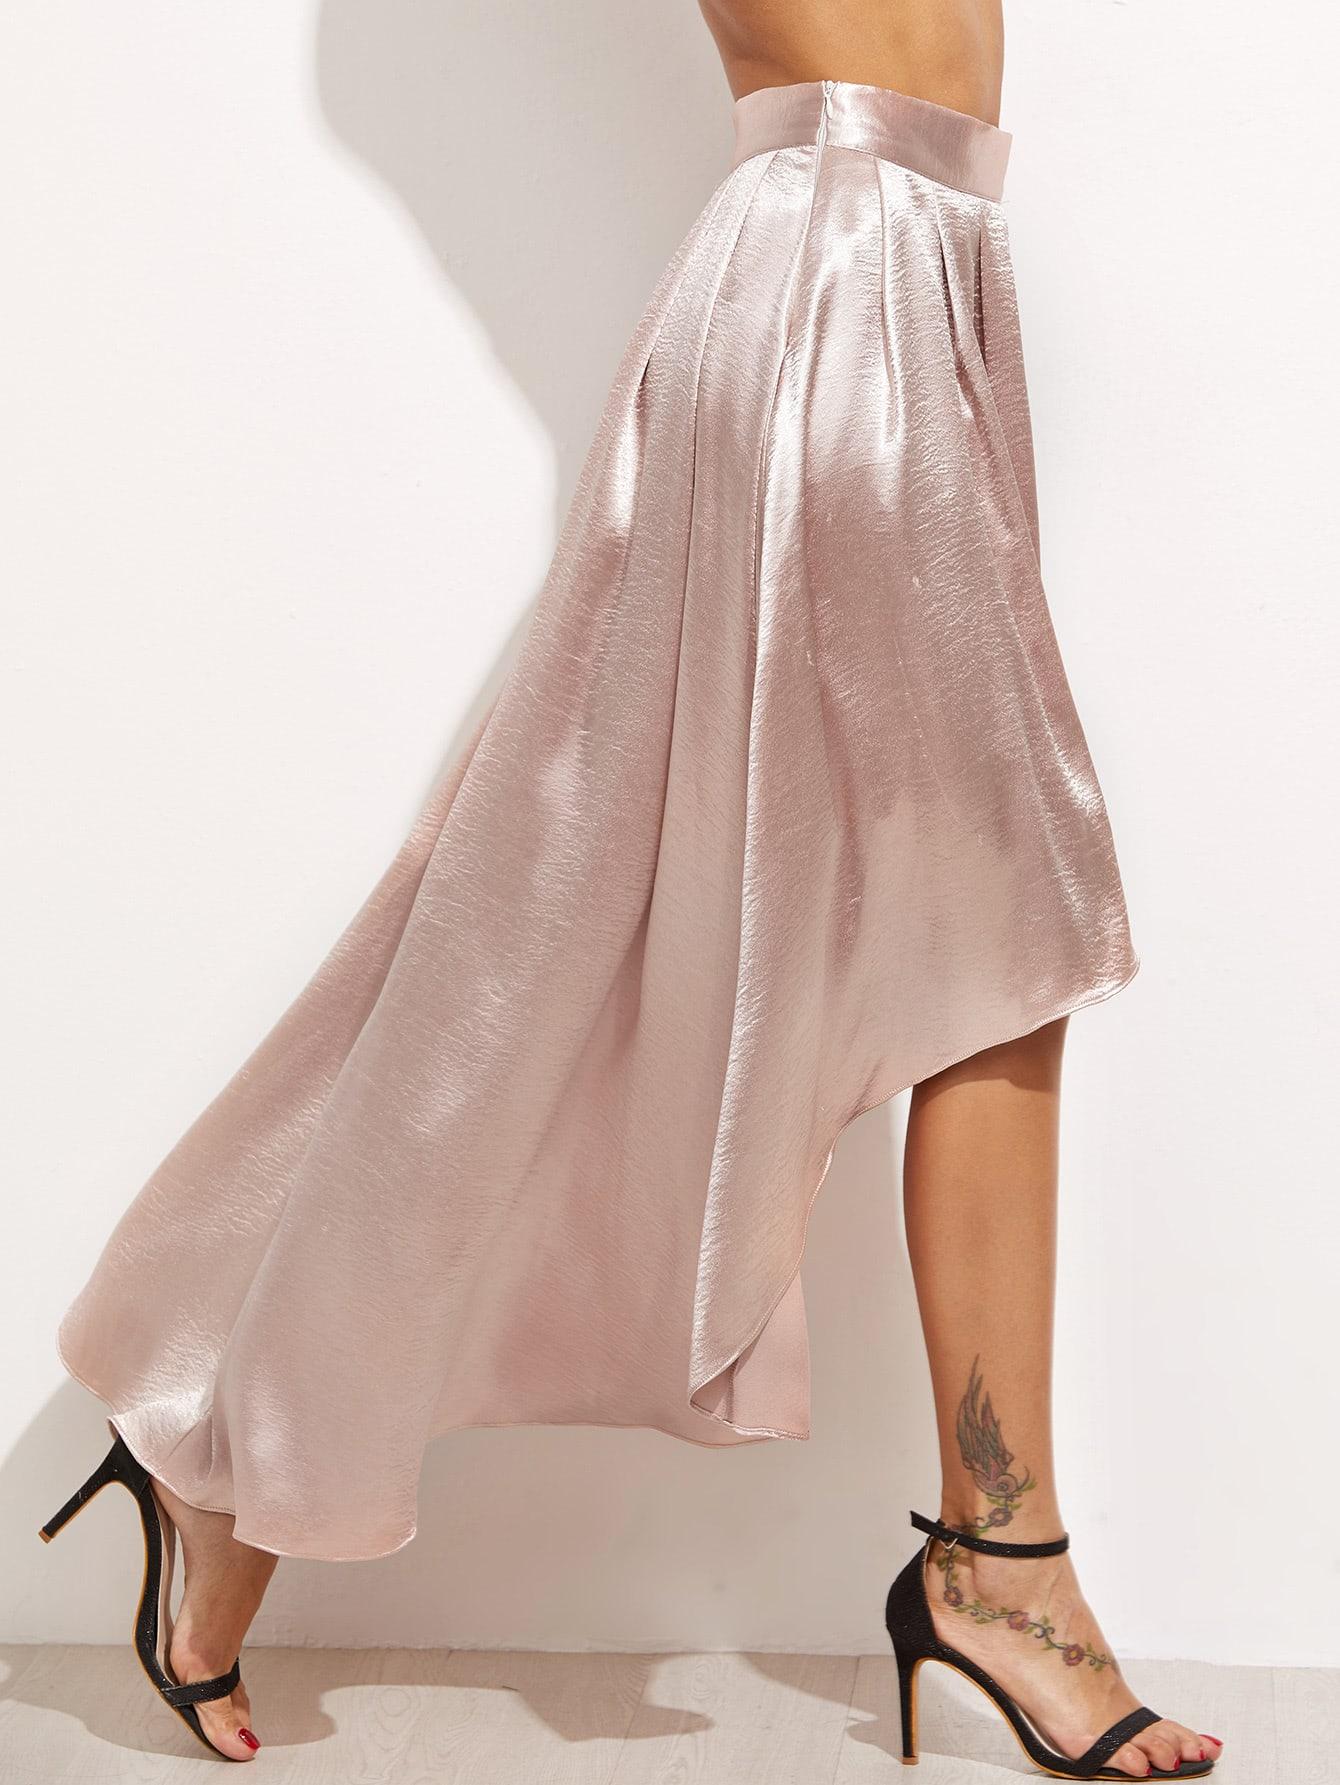 silky rock vorne kurz hinten lang rosa german shein. Black Bedroom Furniture Sets. Home Design Ideas